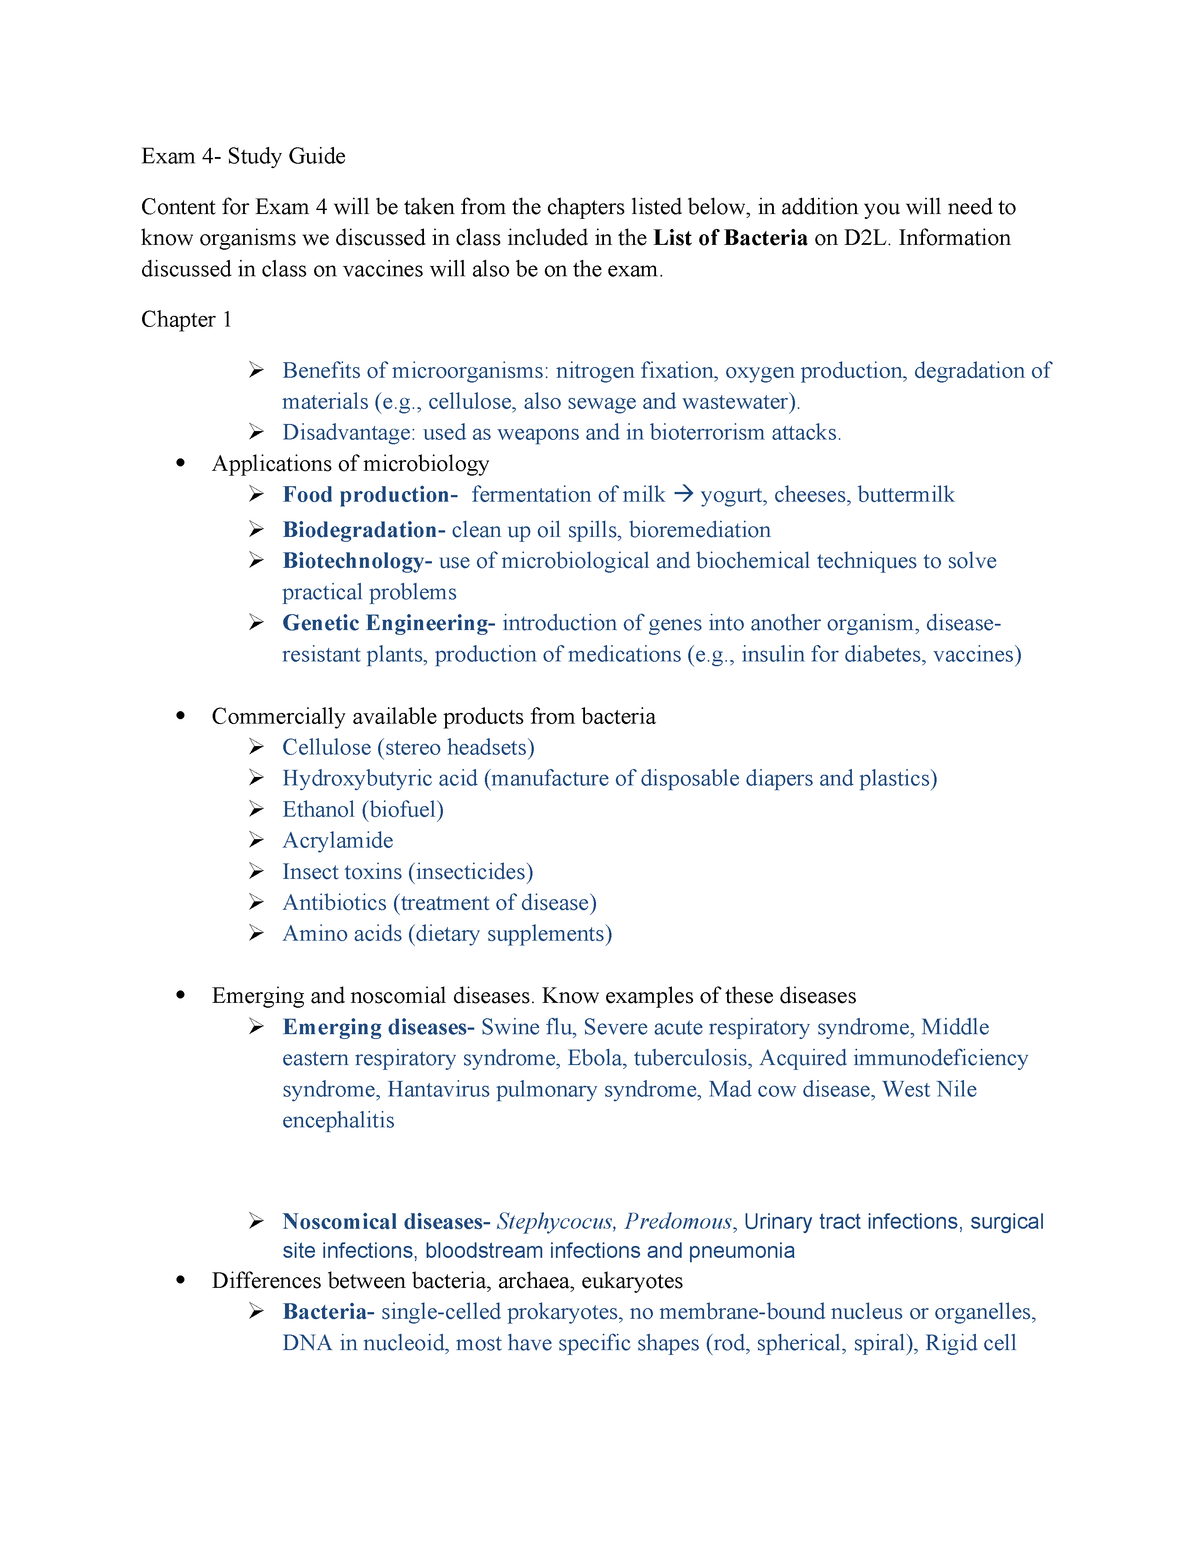 Exam 2016 - BIOL 2300: Microbiology & Public Health - StuDocu